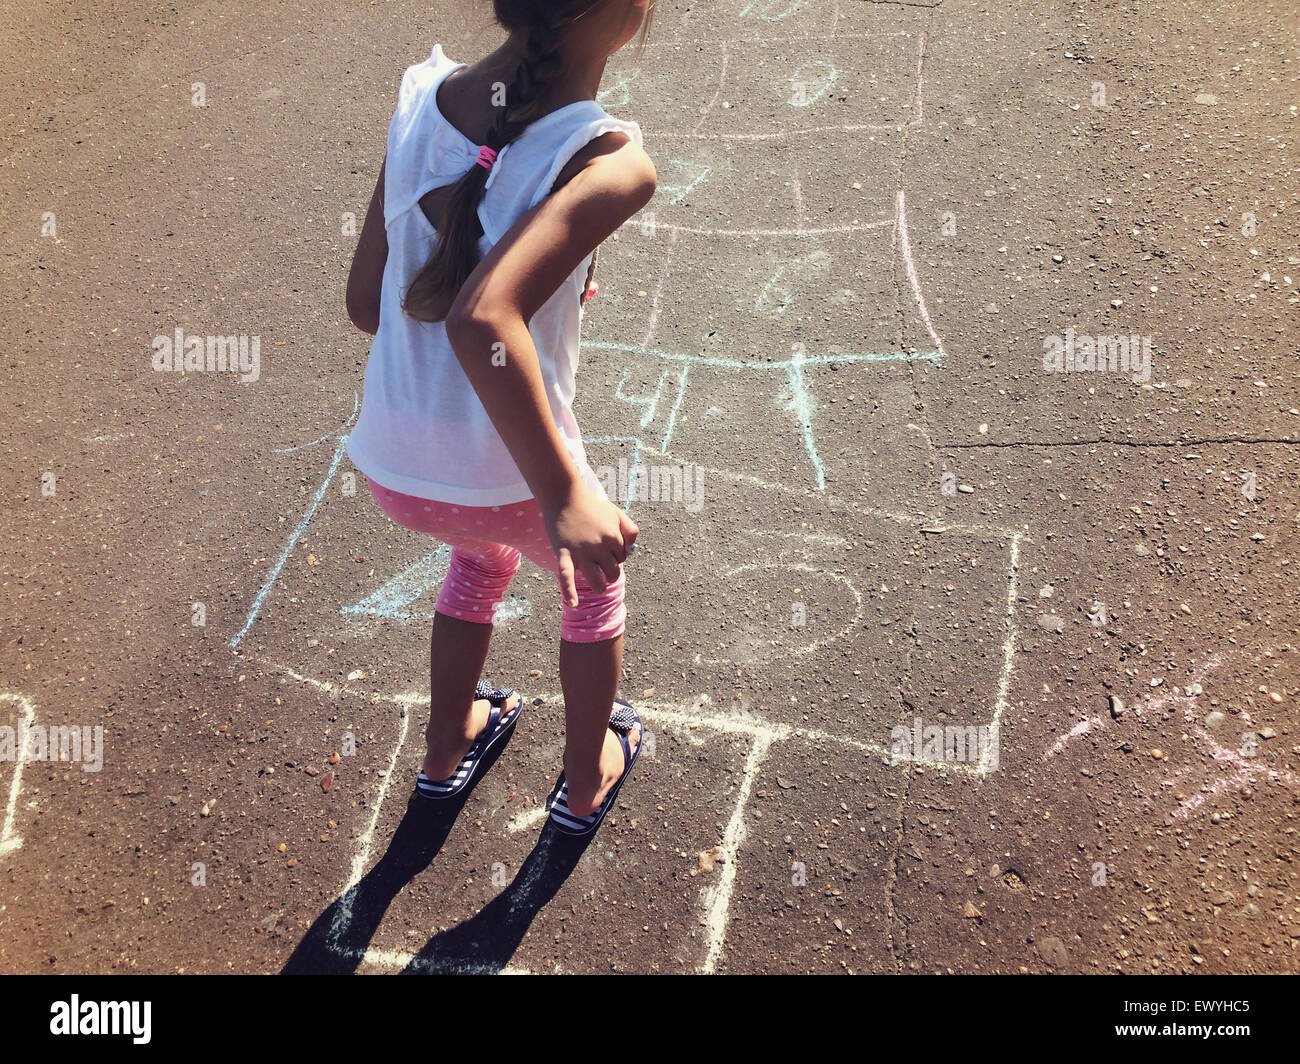 Girl Playing Hopscotch Stock Photo